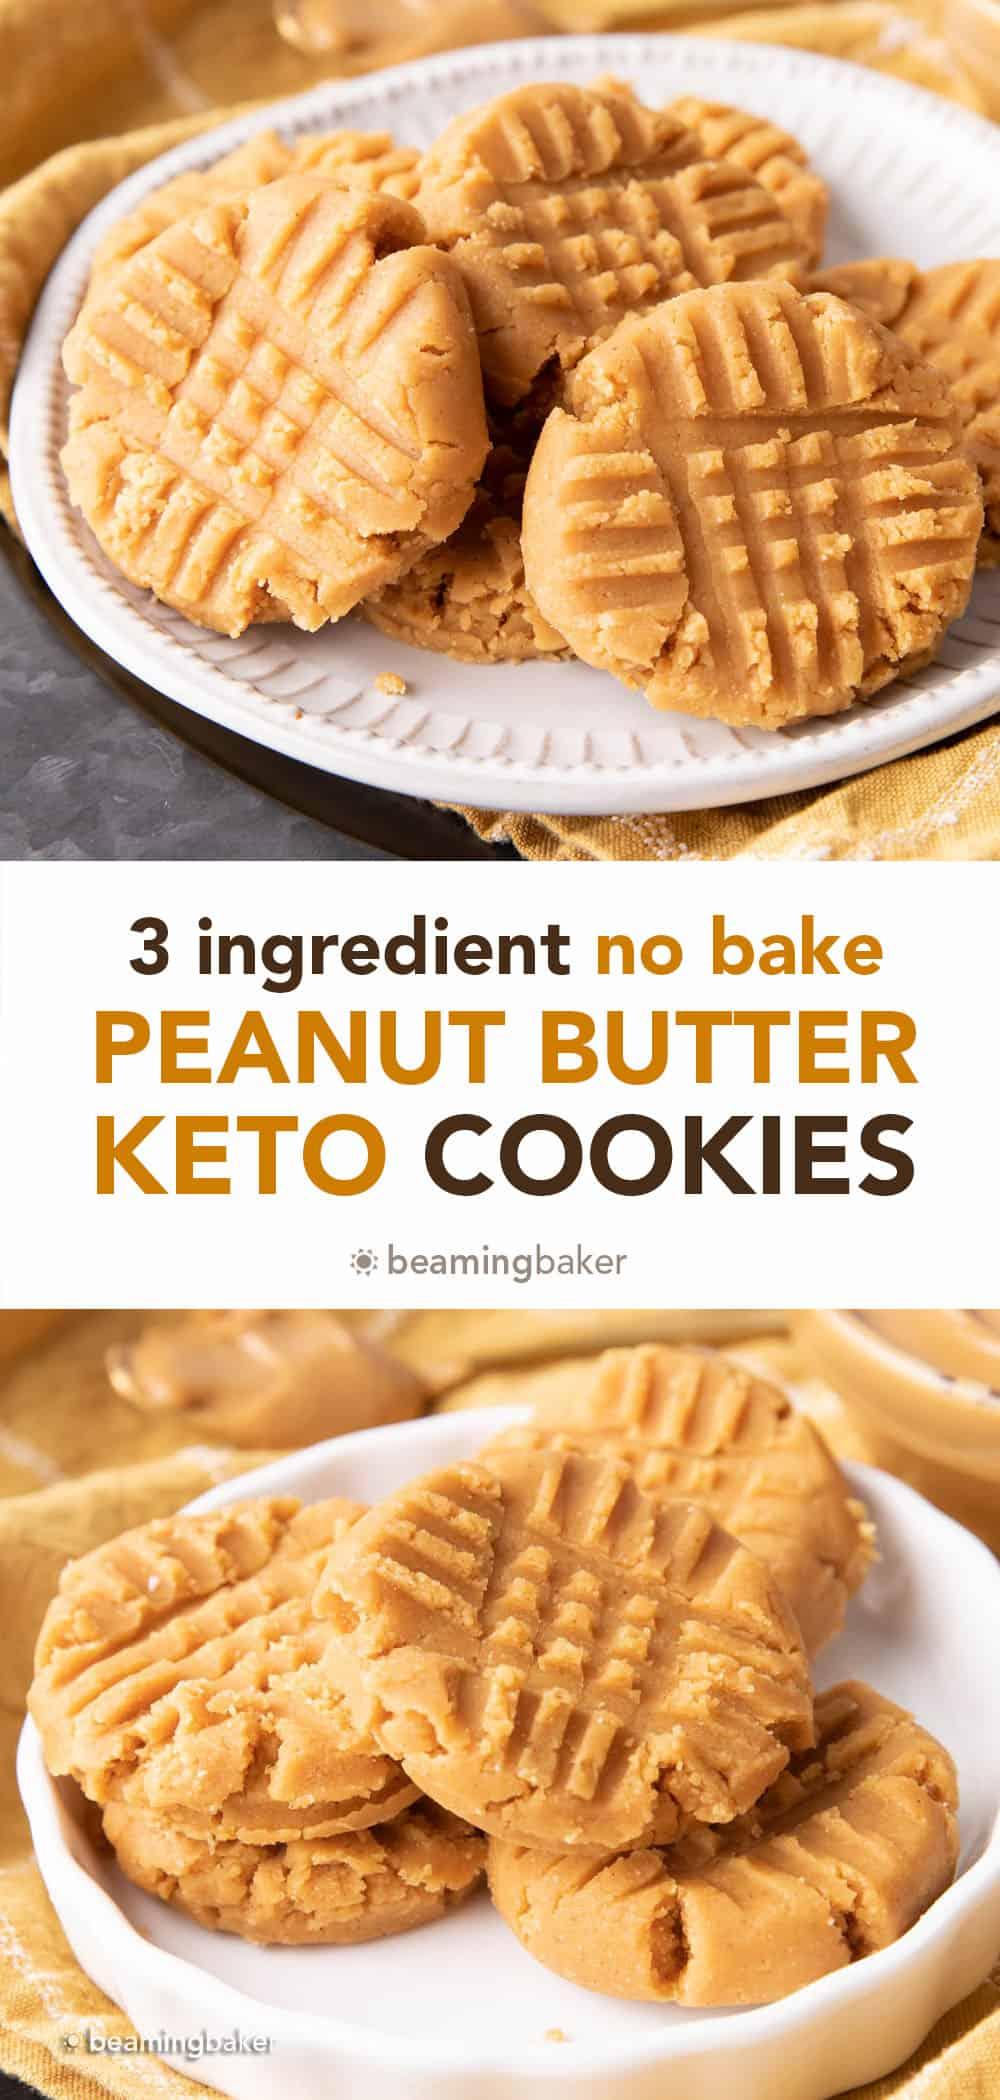 Keto No Bake Cookies: an easy 3 ingredient recipe for keto no bake peanut butter cookies! So easy to make, so delicious to eat. Low Carb. #Keto #NoBake #KetoCookies #PeanutButter | Recipe at BeamingBaker.com